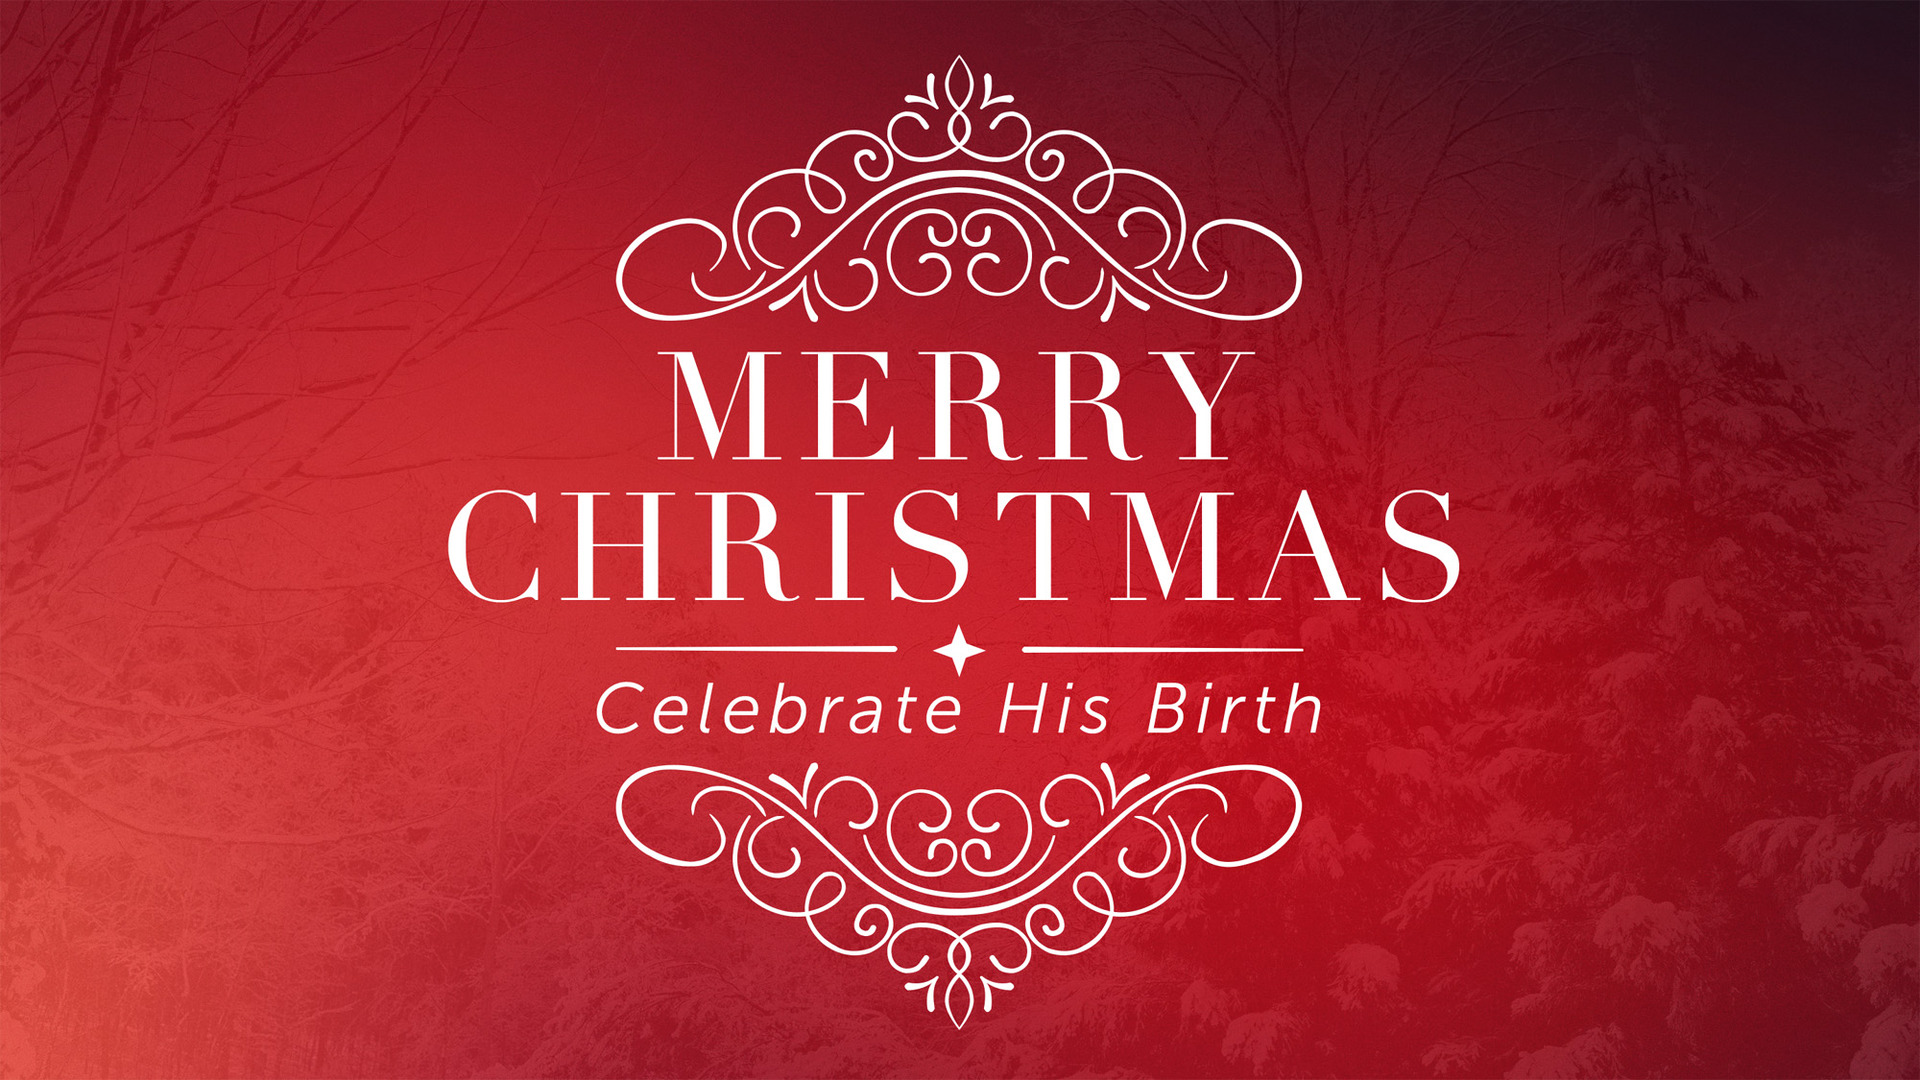 merry_christmas-title-1-still-16x9.jpg